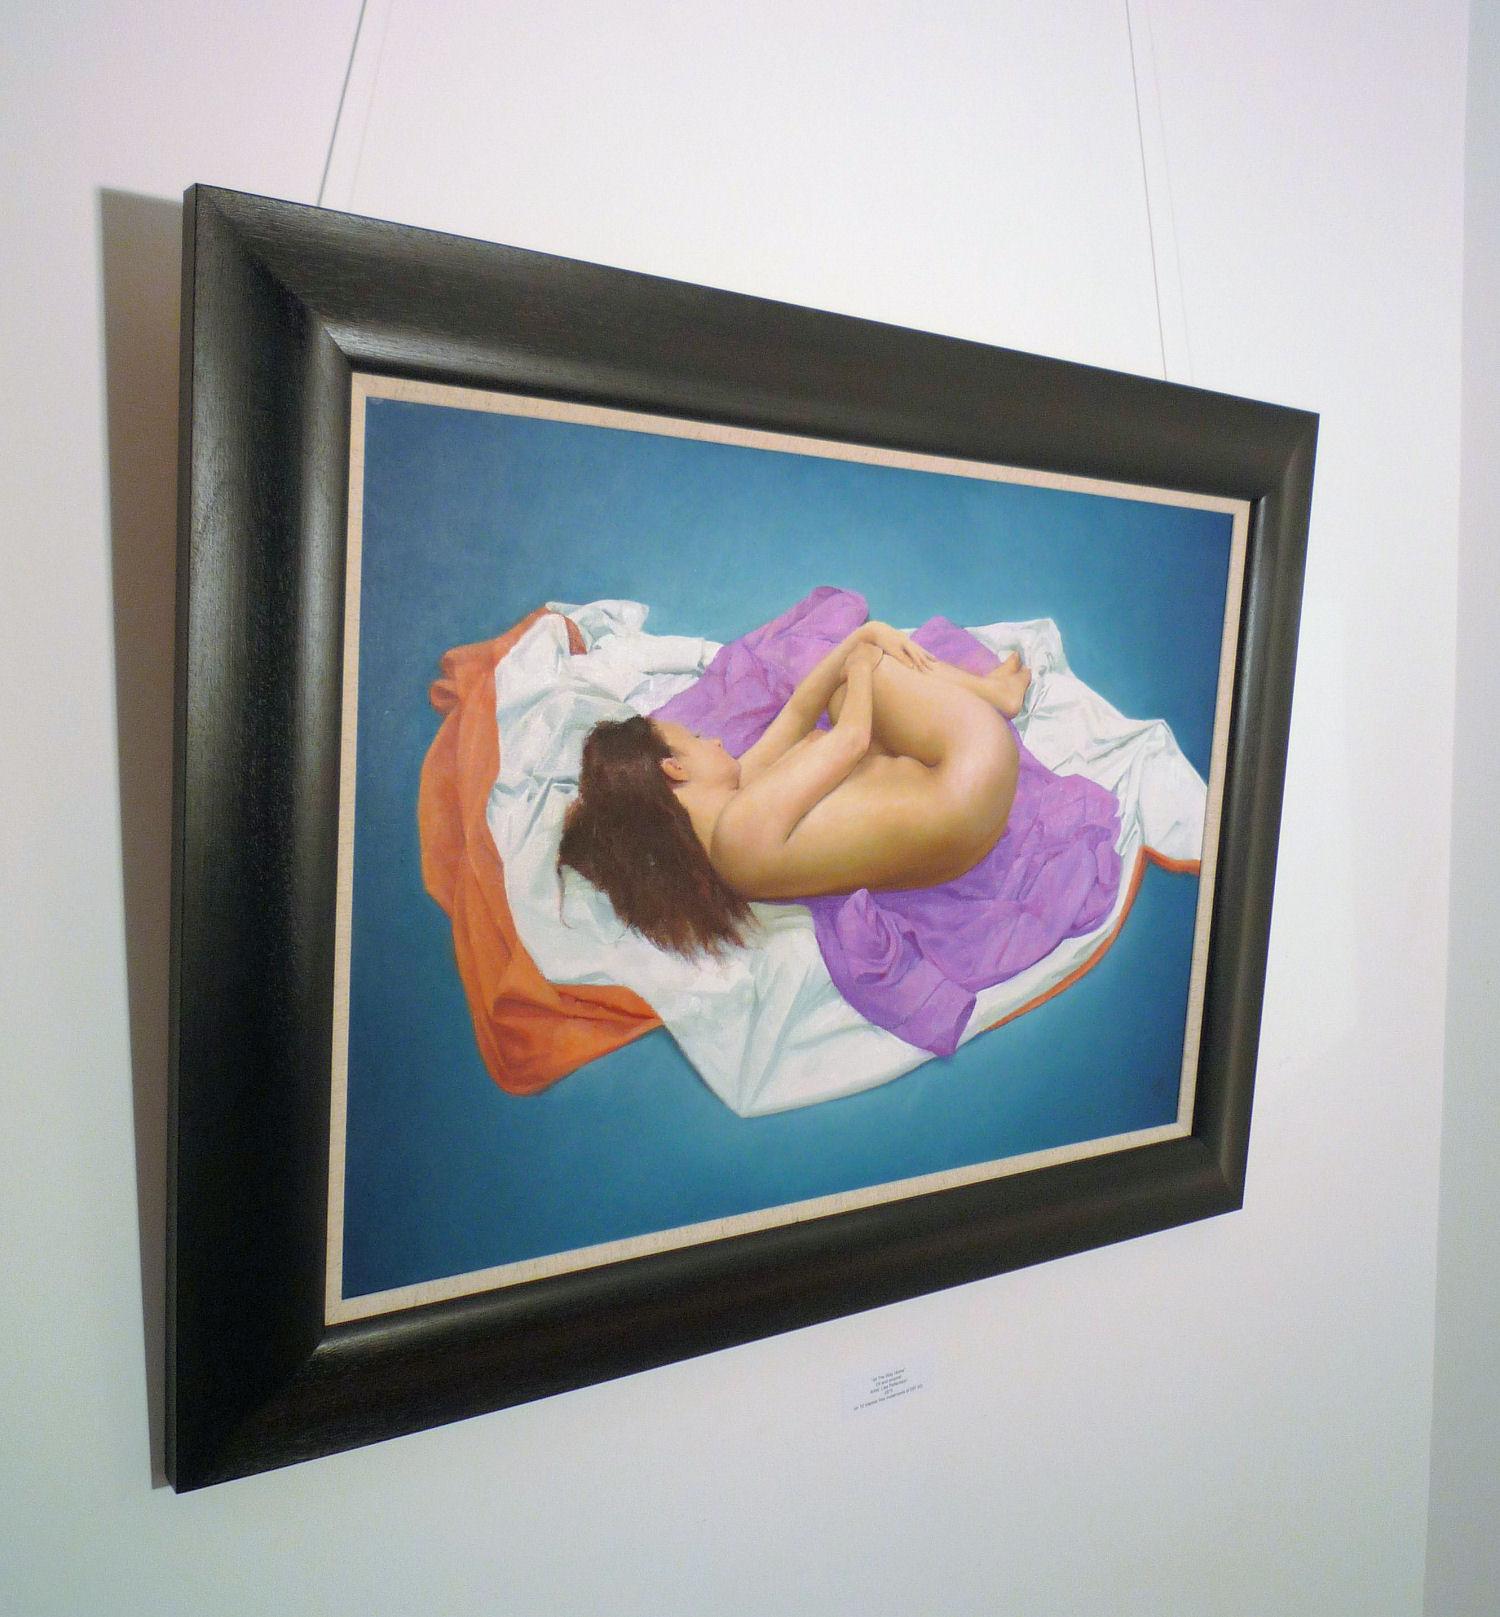 'Reclining Figure' by artist Stuart Sim